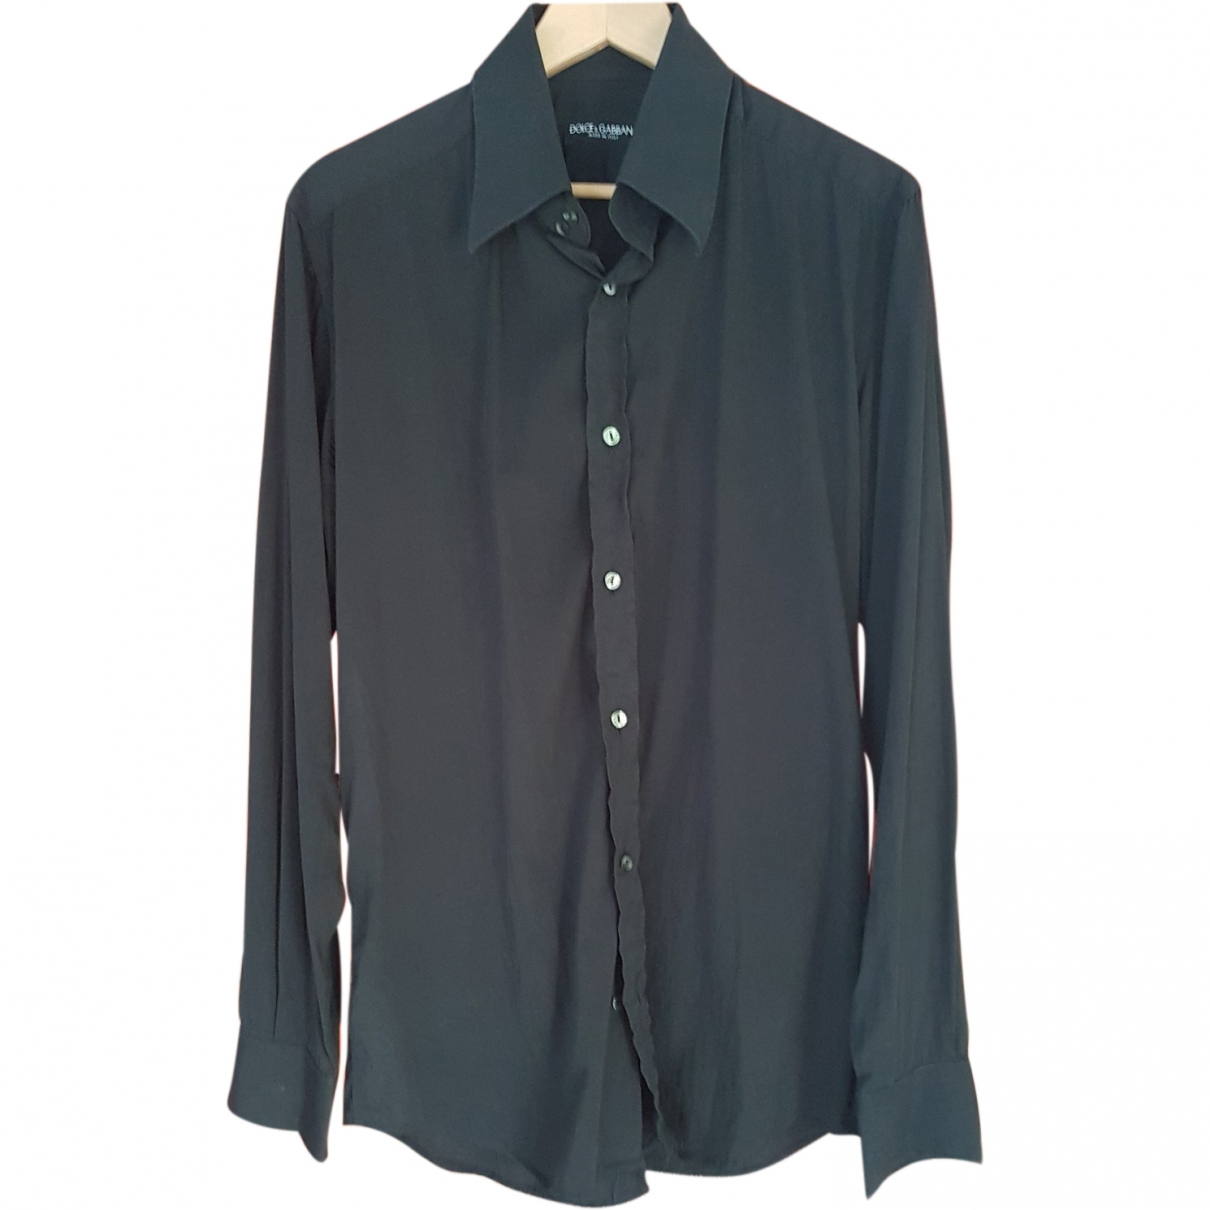 Dolce & Gabbana \N Black Cotton Shirts for Men 16.5 UK - US (tour de cou / collar)